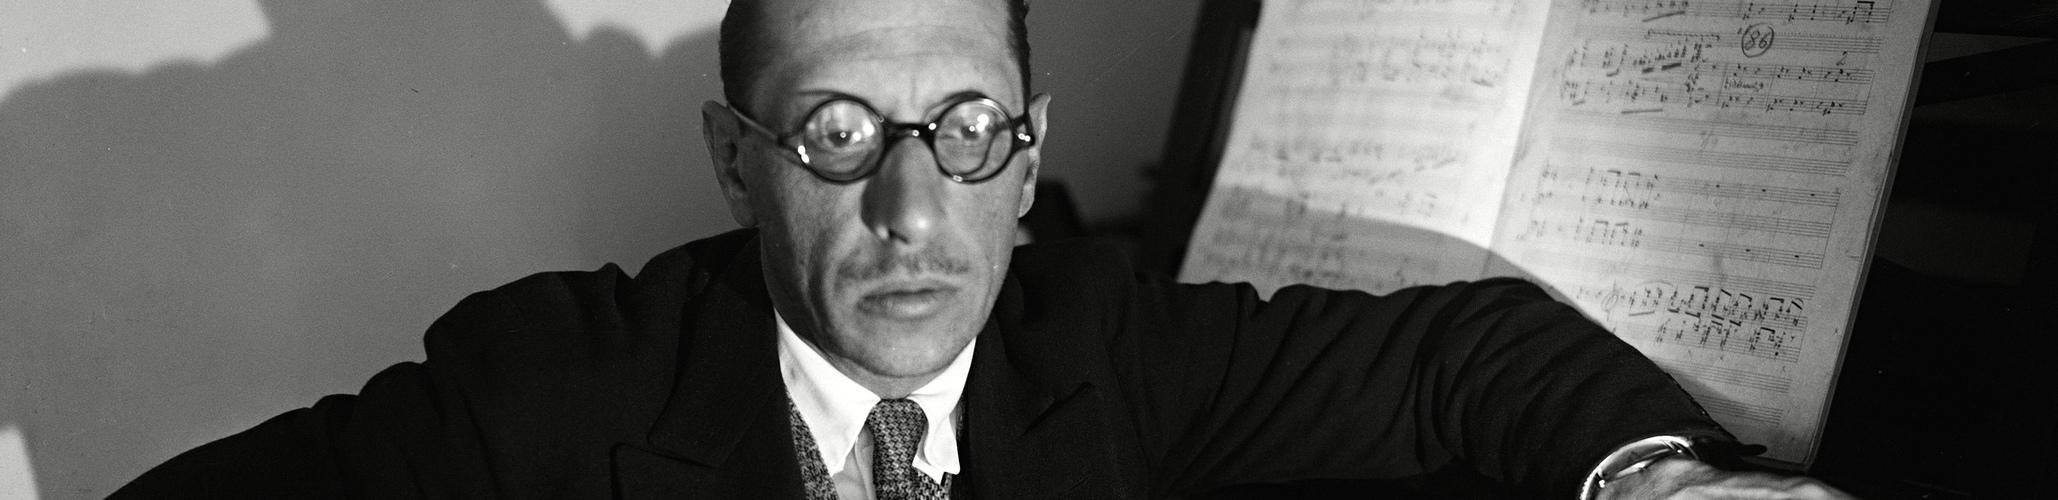 Igor-Stravinsky-009